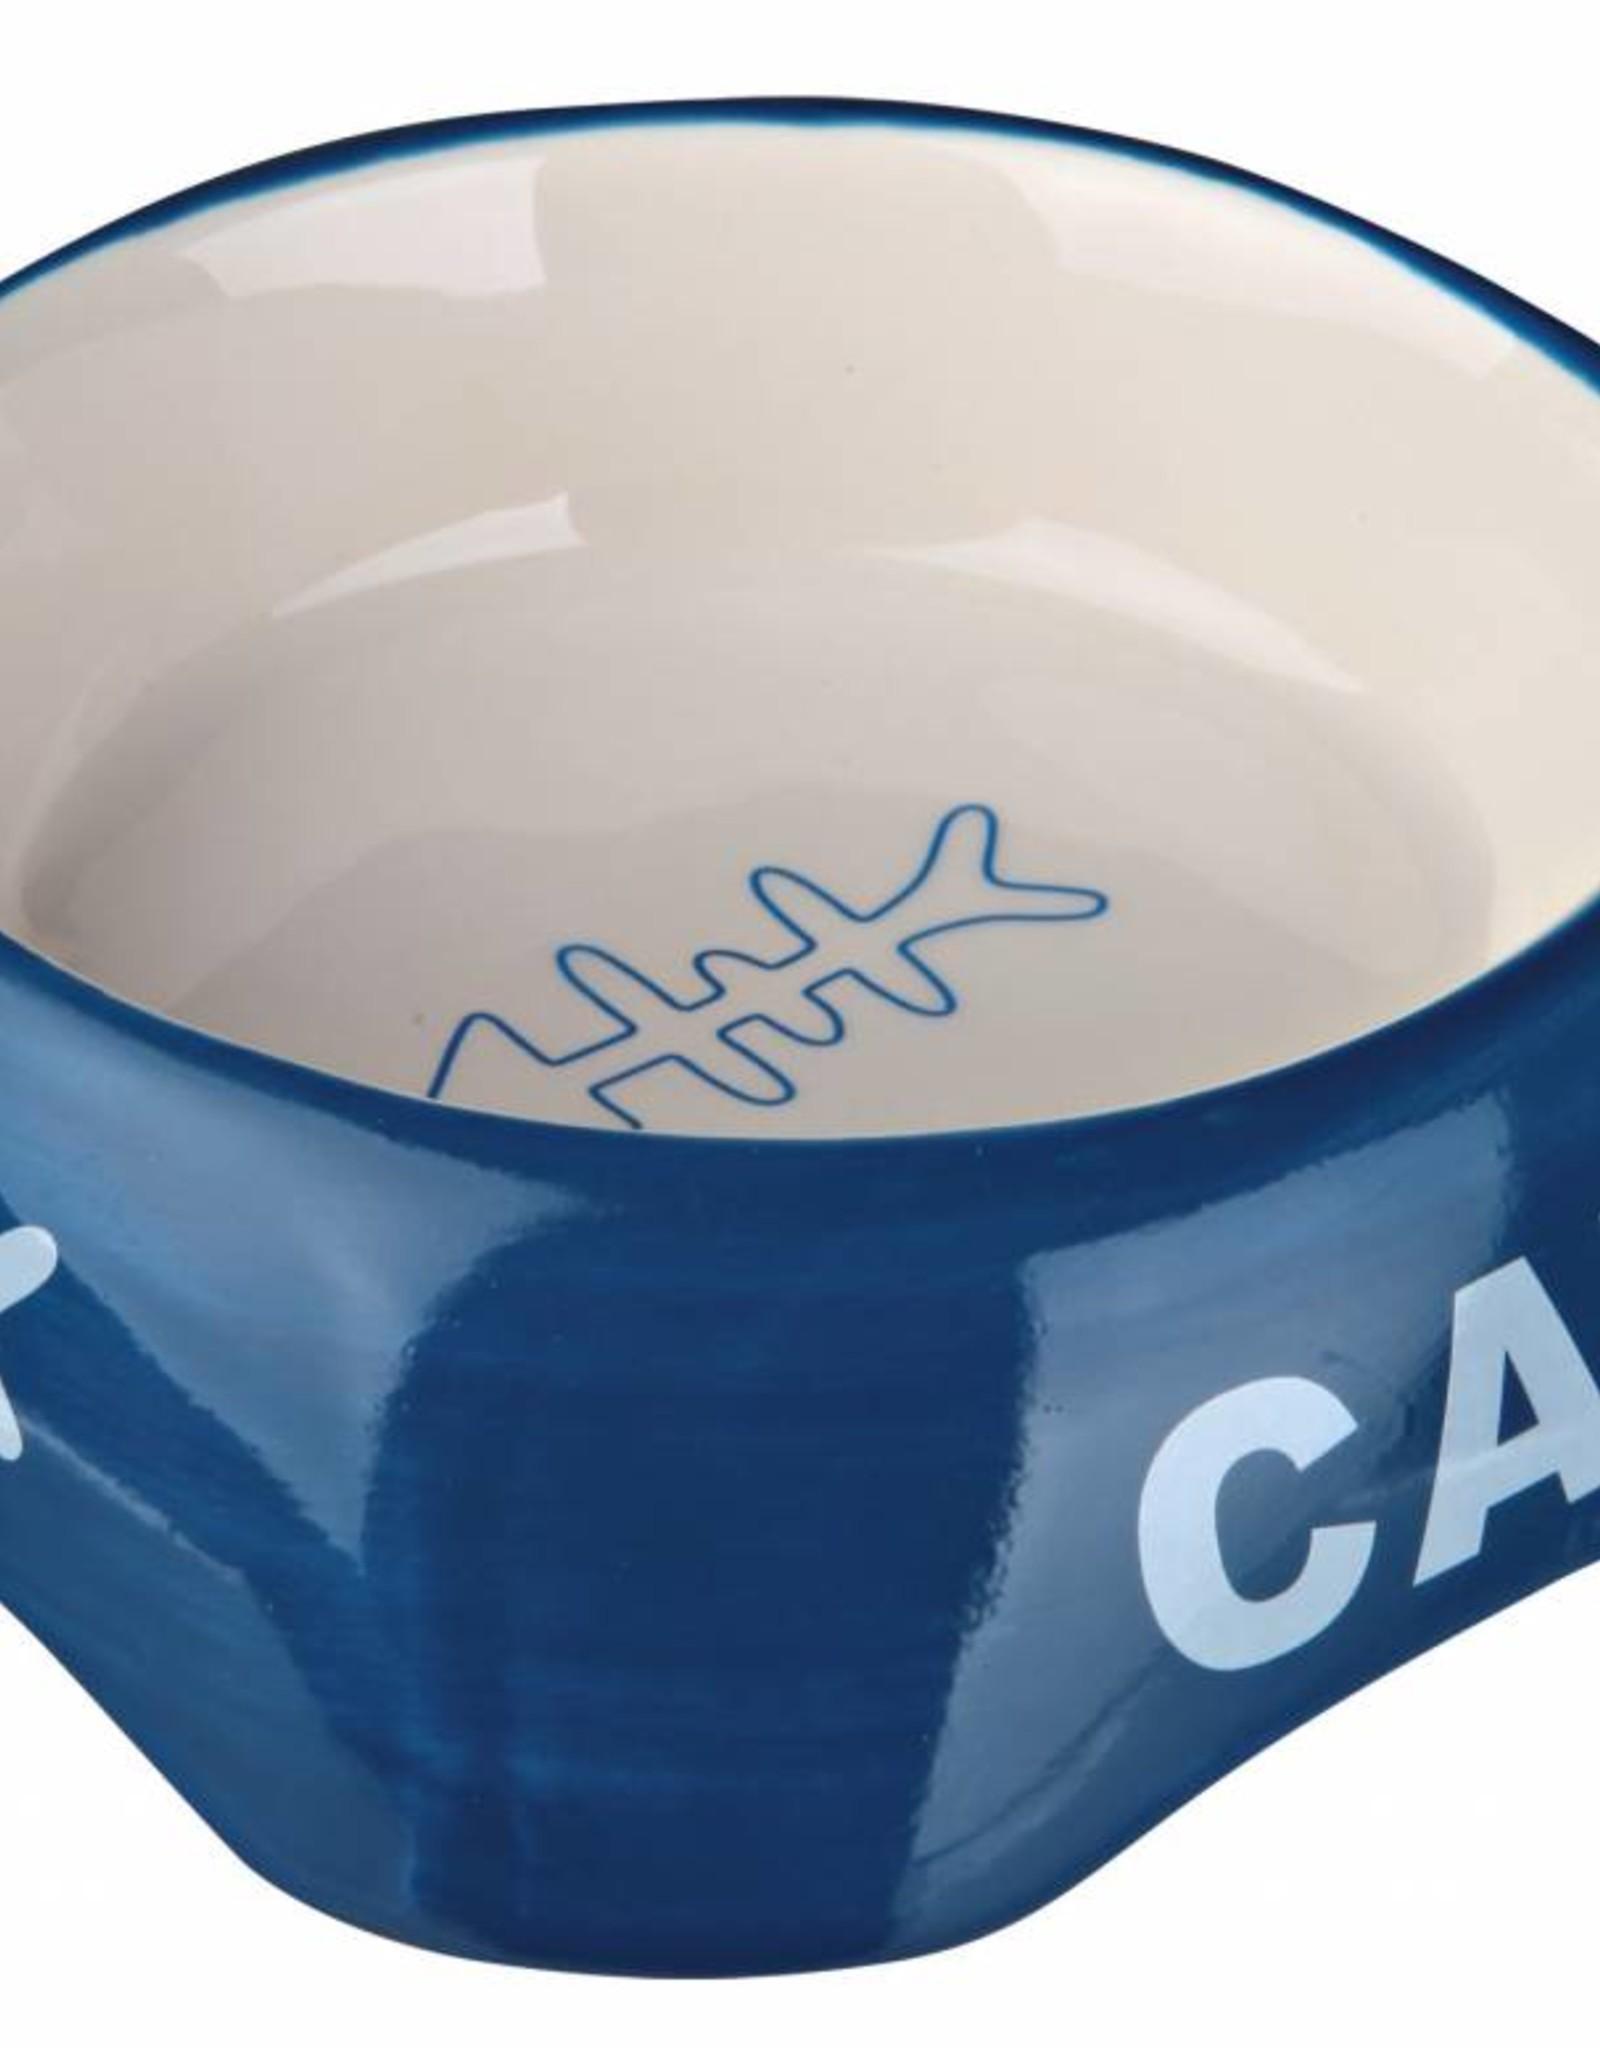 Trixie Ceramic Cat Bowl, 13cm in various colours